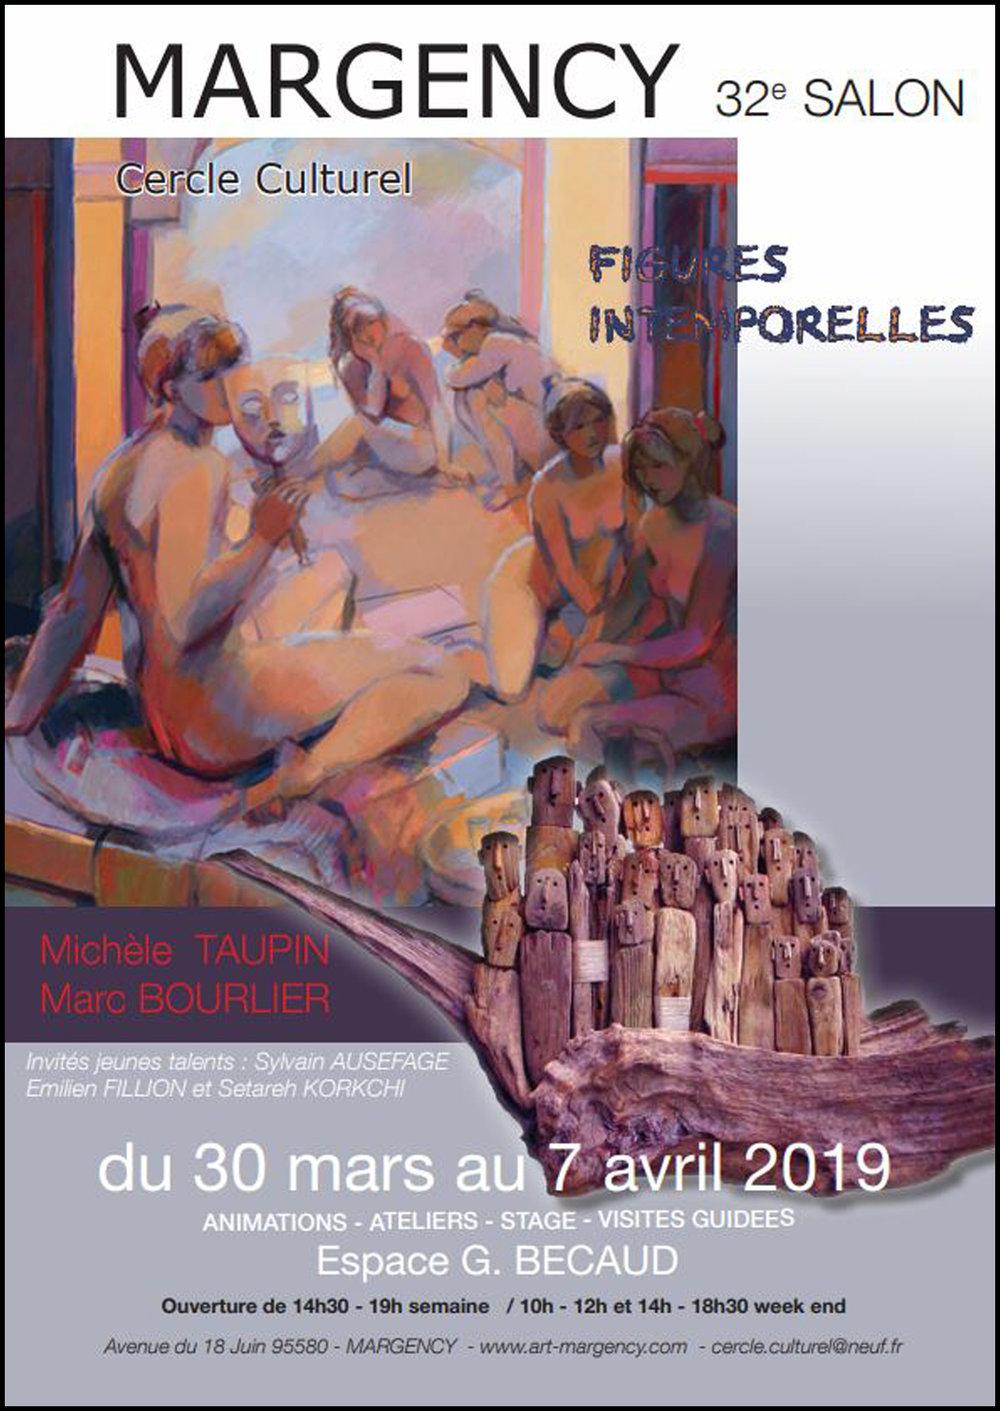 CERCLE CULTUREL - MARGENCY, FRANCEExpo: 30/03/2019 - 07/04/2019Vernissage: 30/03/2019 (17h30-21h00)